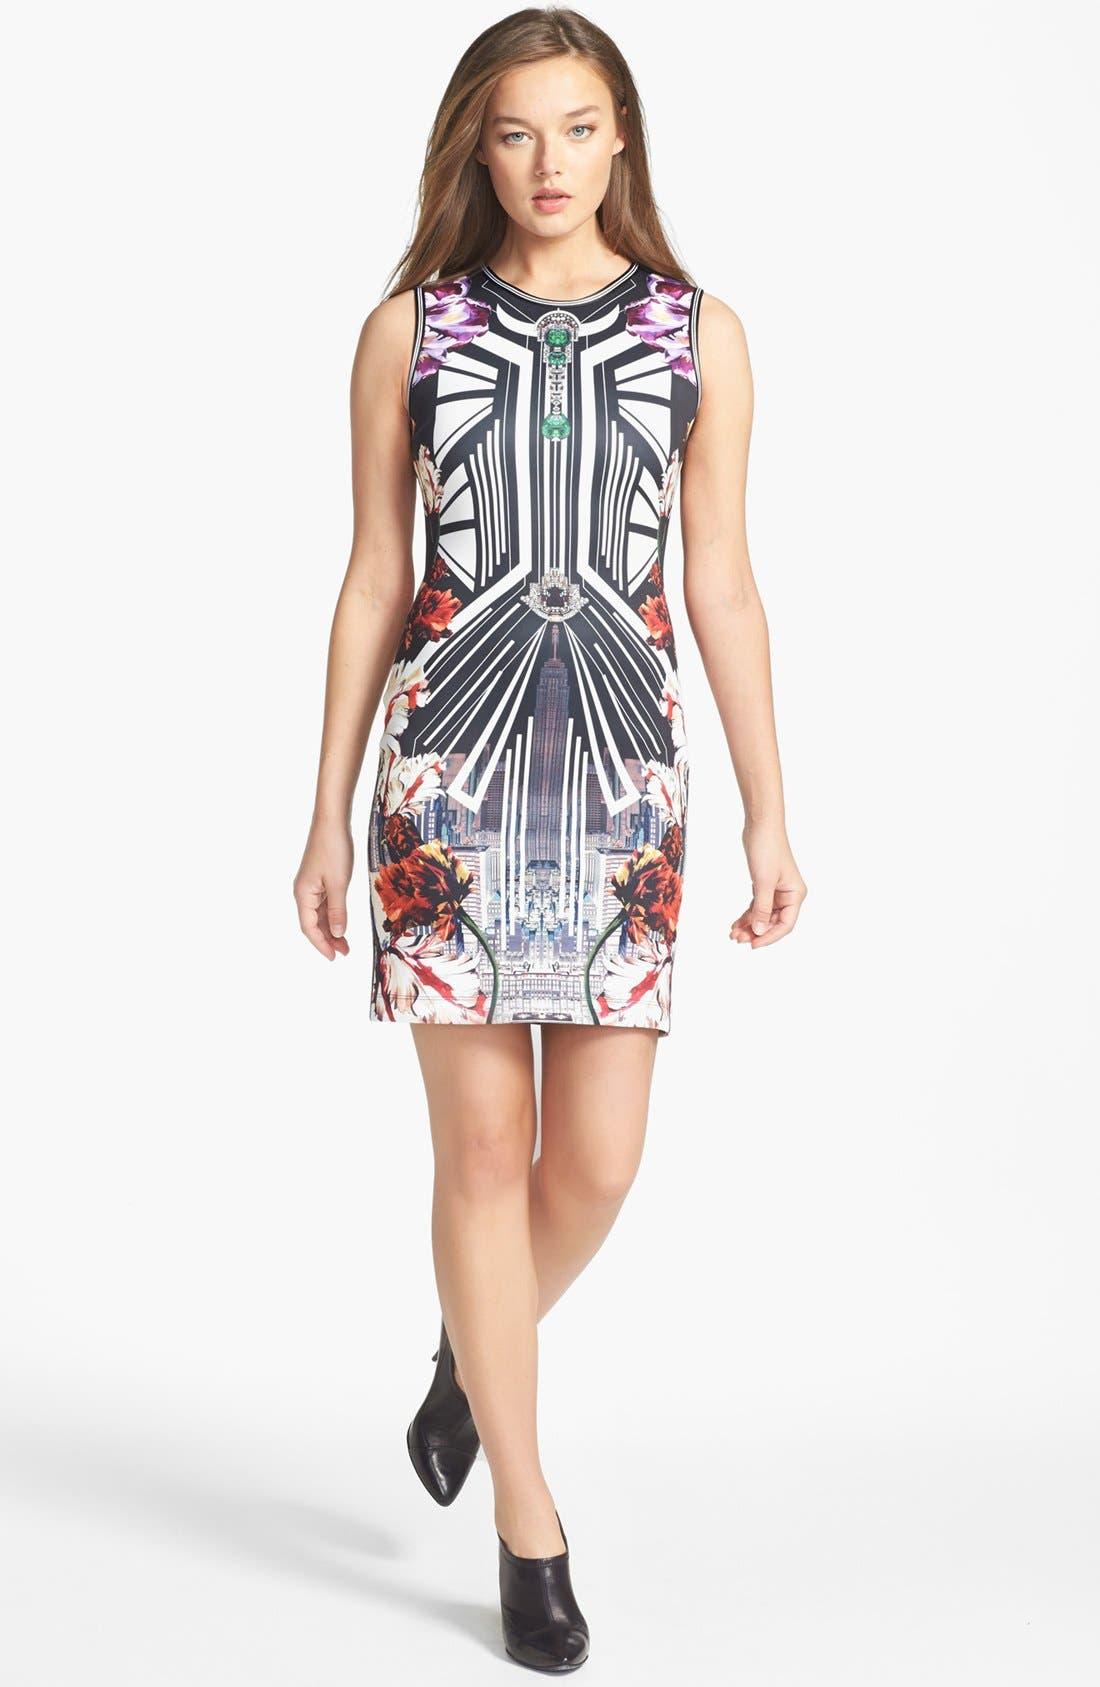 Alternate Image 1 Selected - Clover Canyon 'Deco City' Stretch Sheath Dress